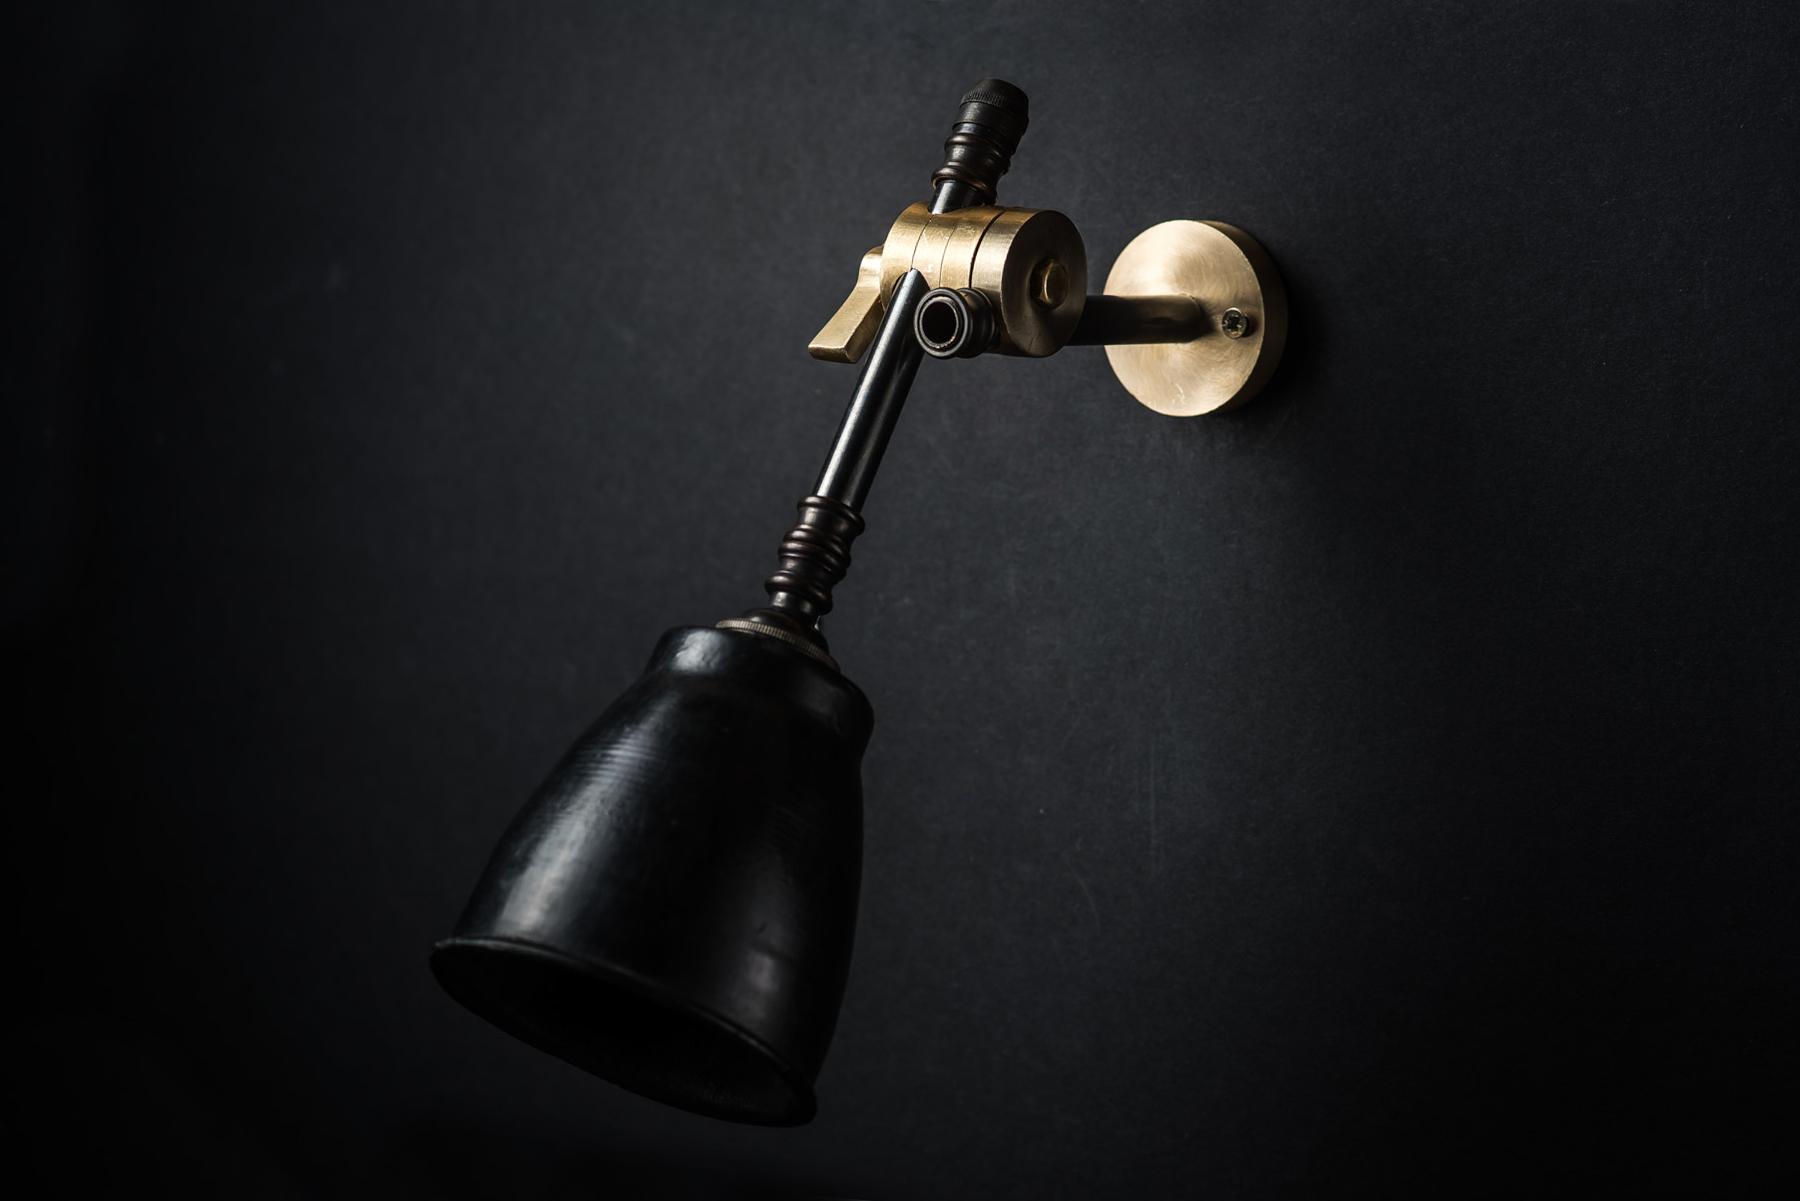 brass bronze and vulcan black stone adjustable wall light 02.jpg